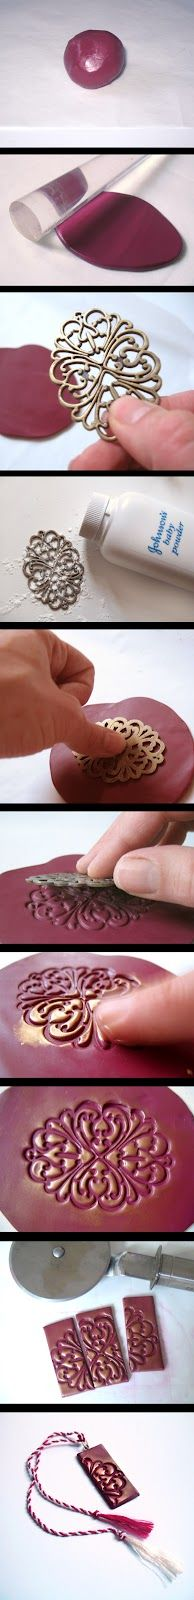 Baghy: DIY polymer clay pendant